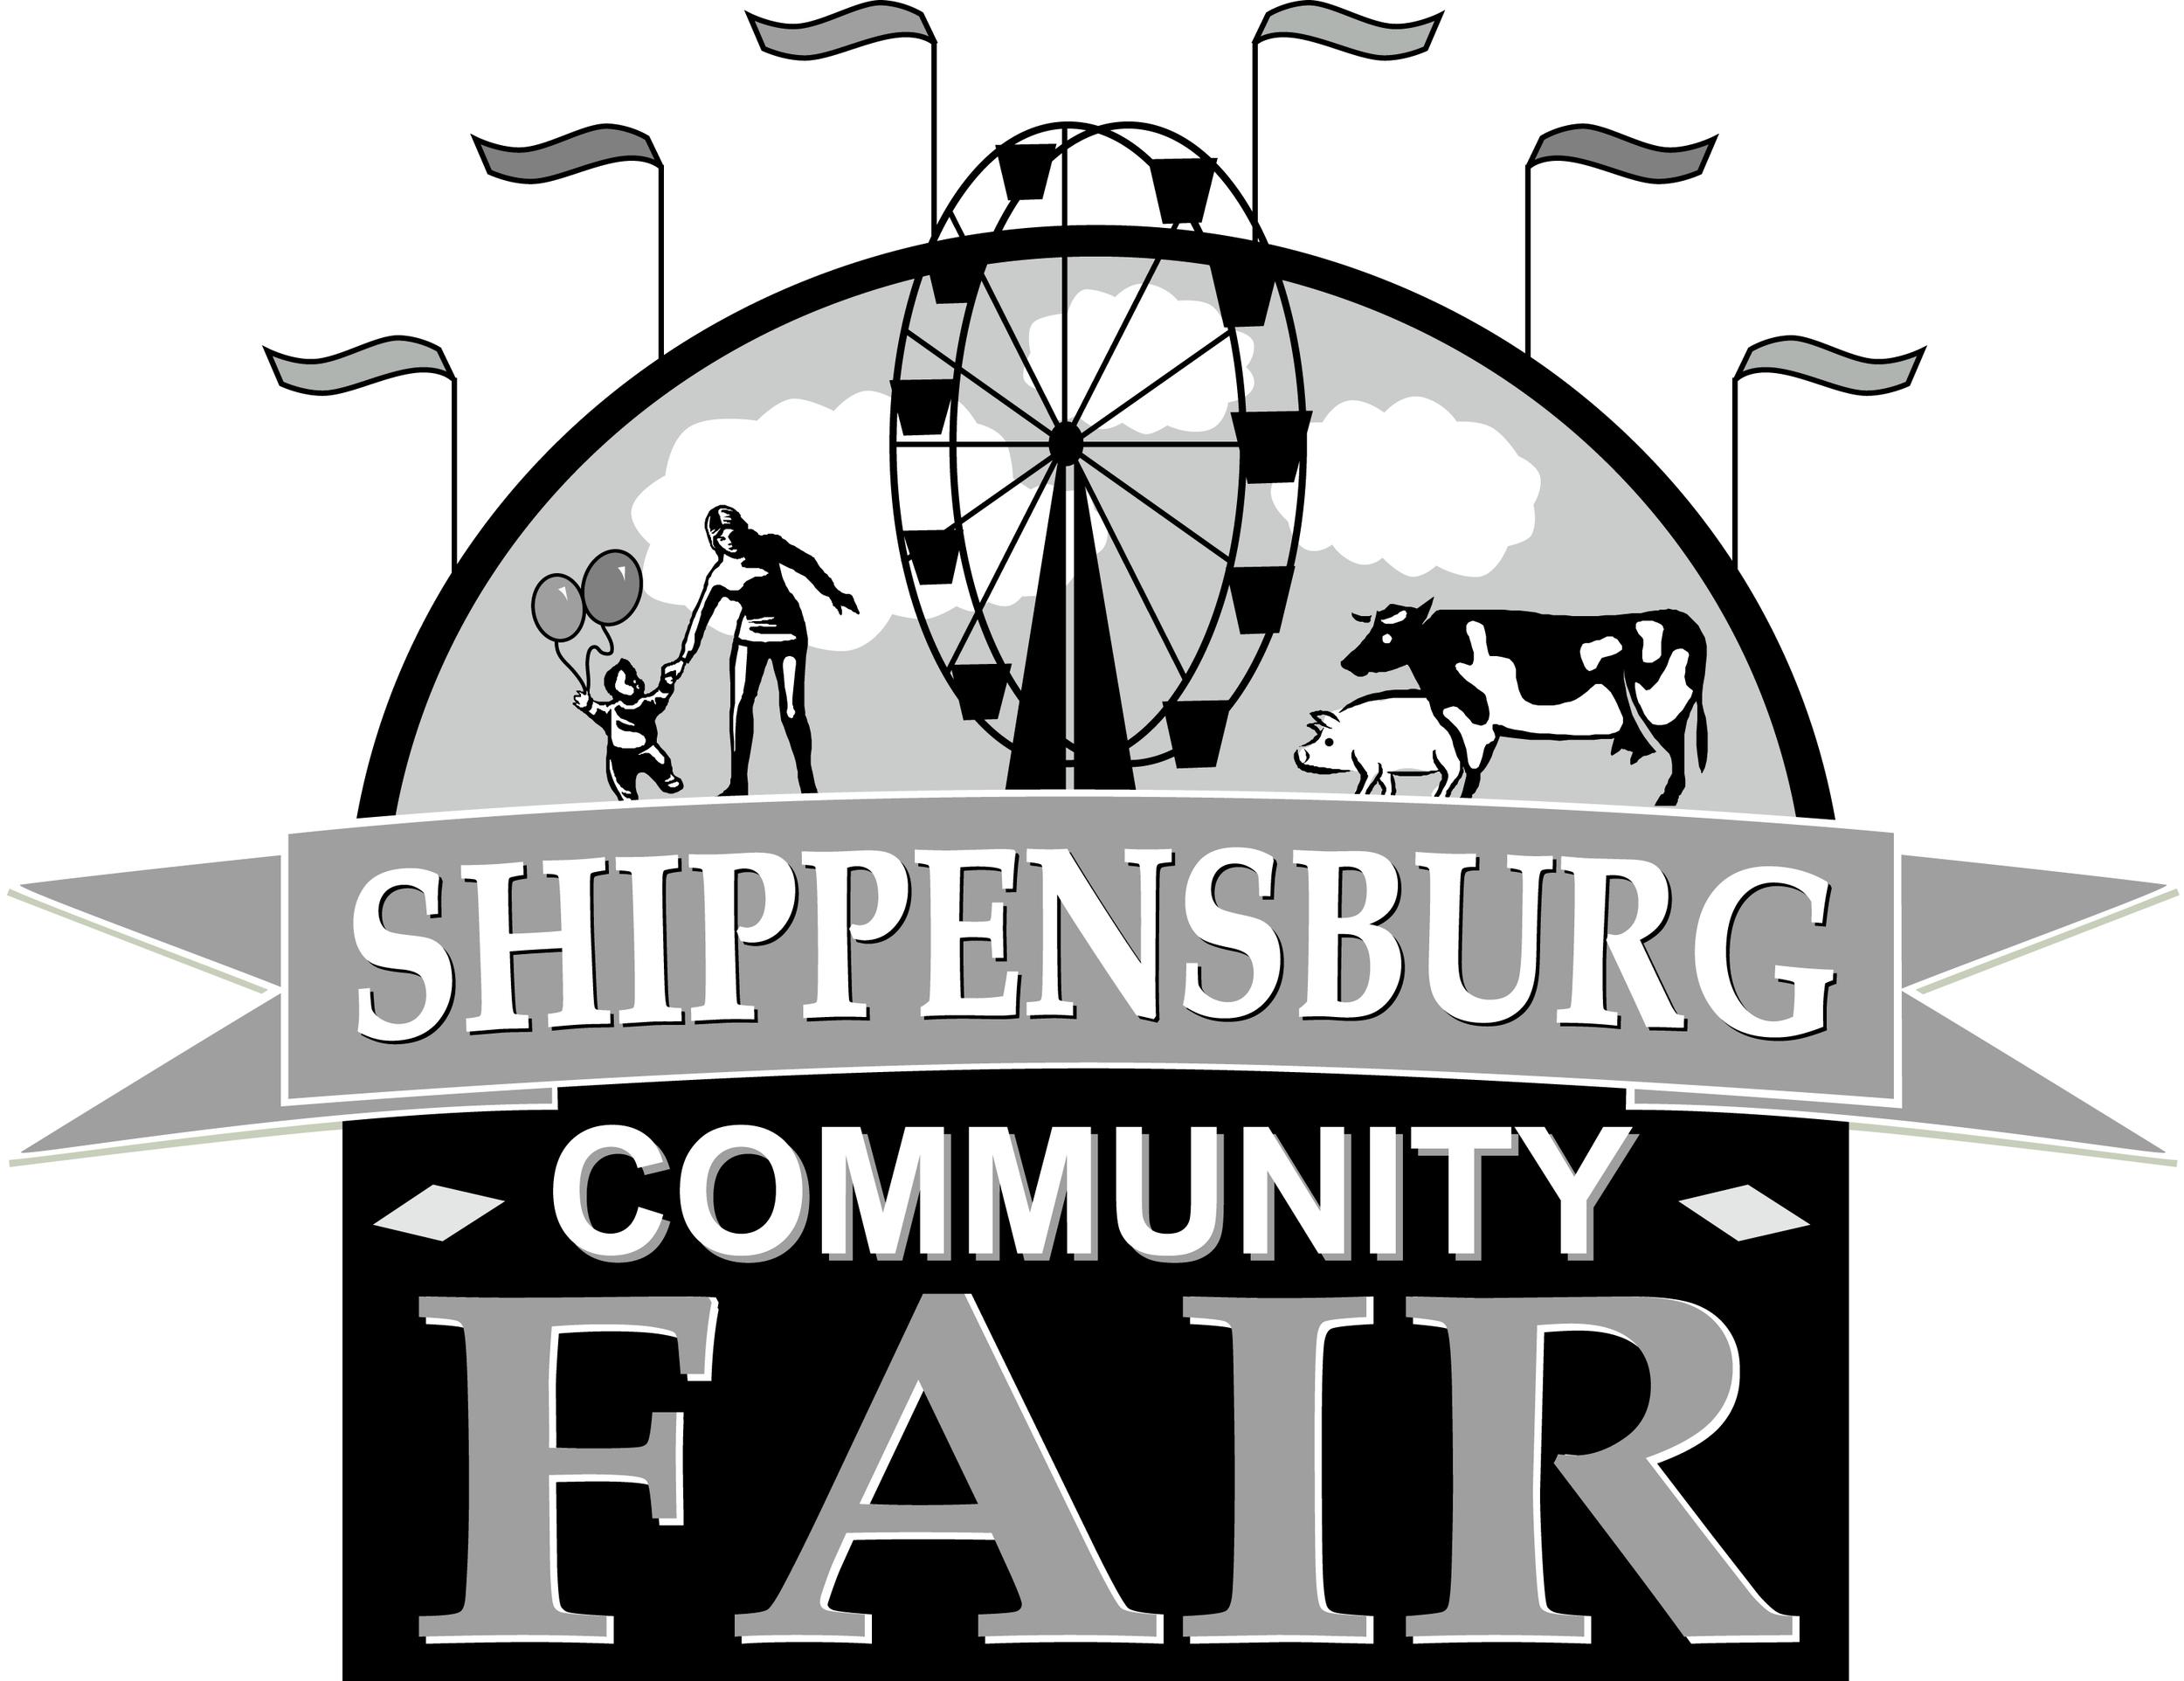 Shippensburg Community Fair Official Logo (B&W)   High Resolution (JPEG) - 1.13 MB